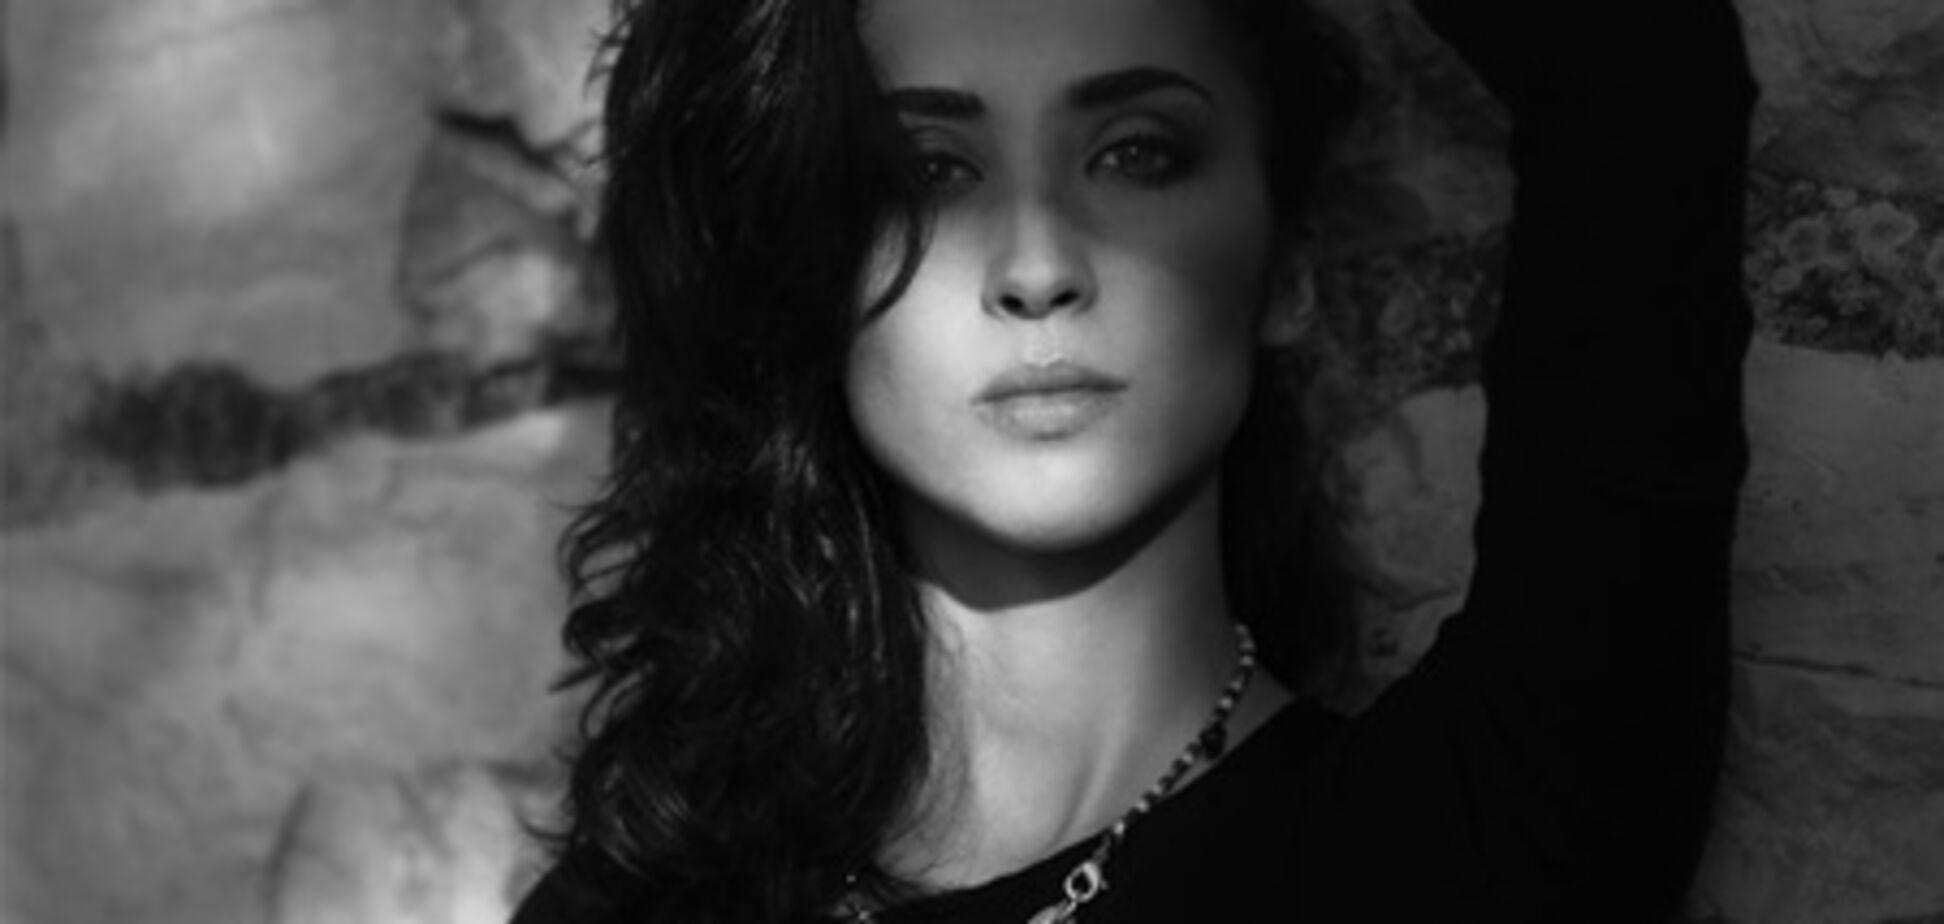 Анна Завальська посварилась з сестрою